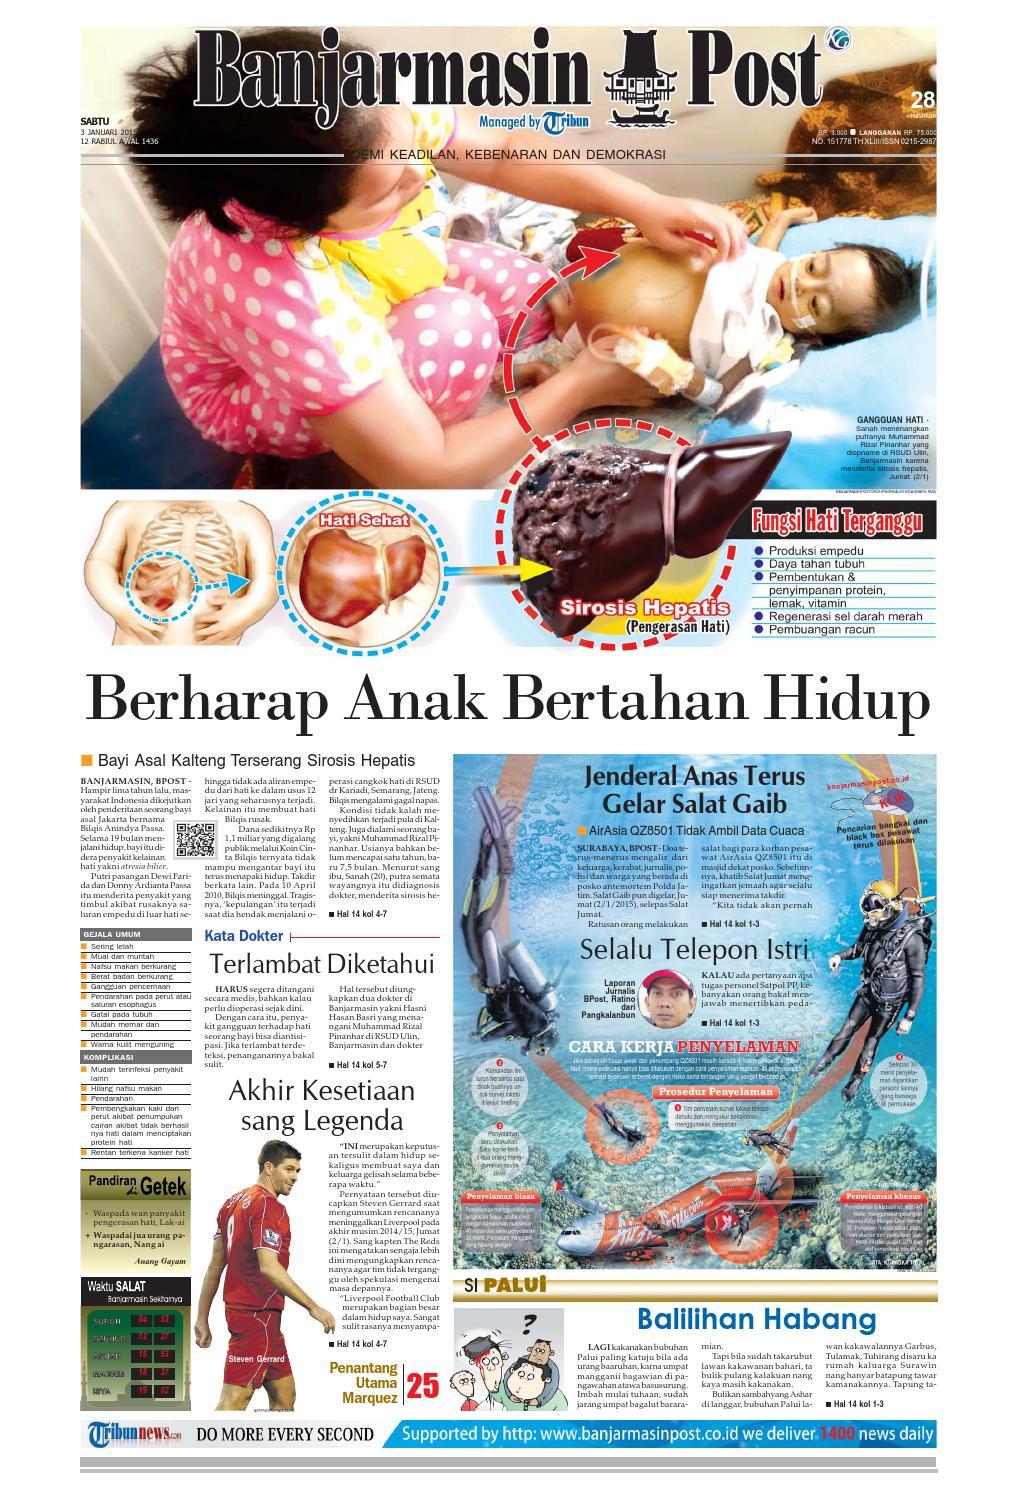 Banjarmasin Post Sabtu 3 Januari 2015 By Issuu Produk Ukm Bumn Tenun Pagatan Kemeja Pria Biru Kapal